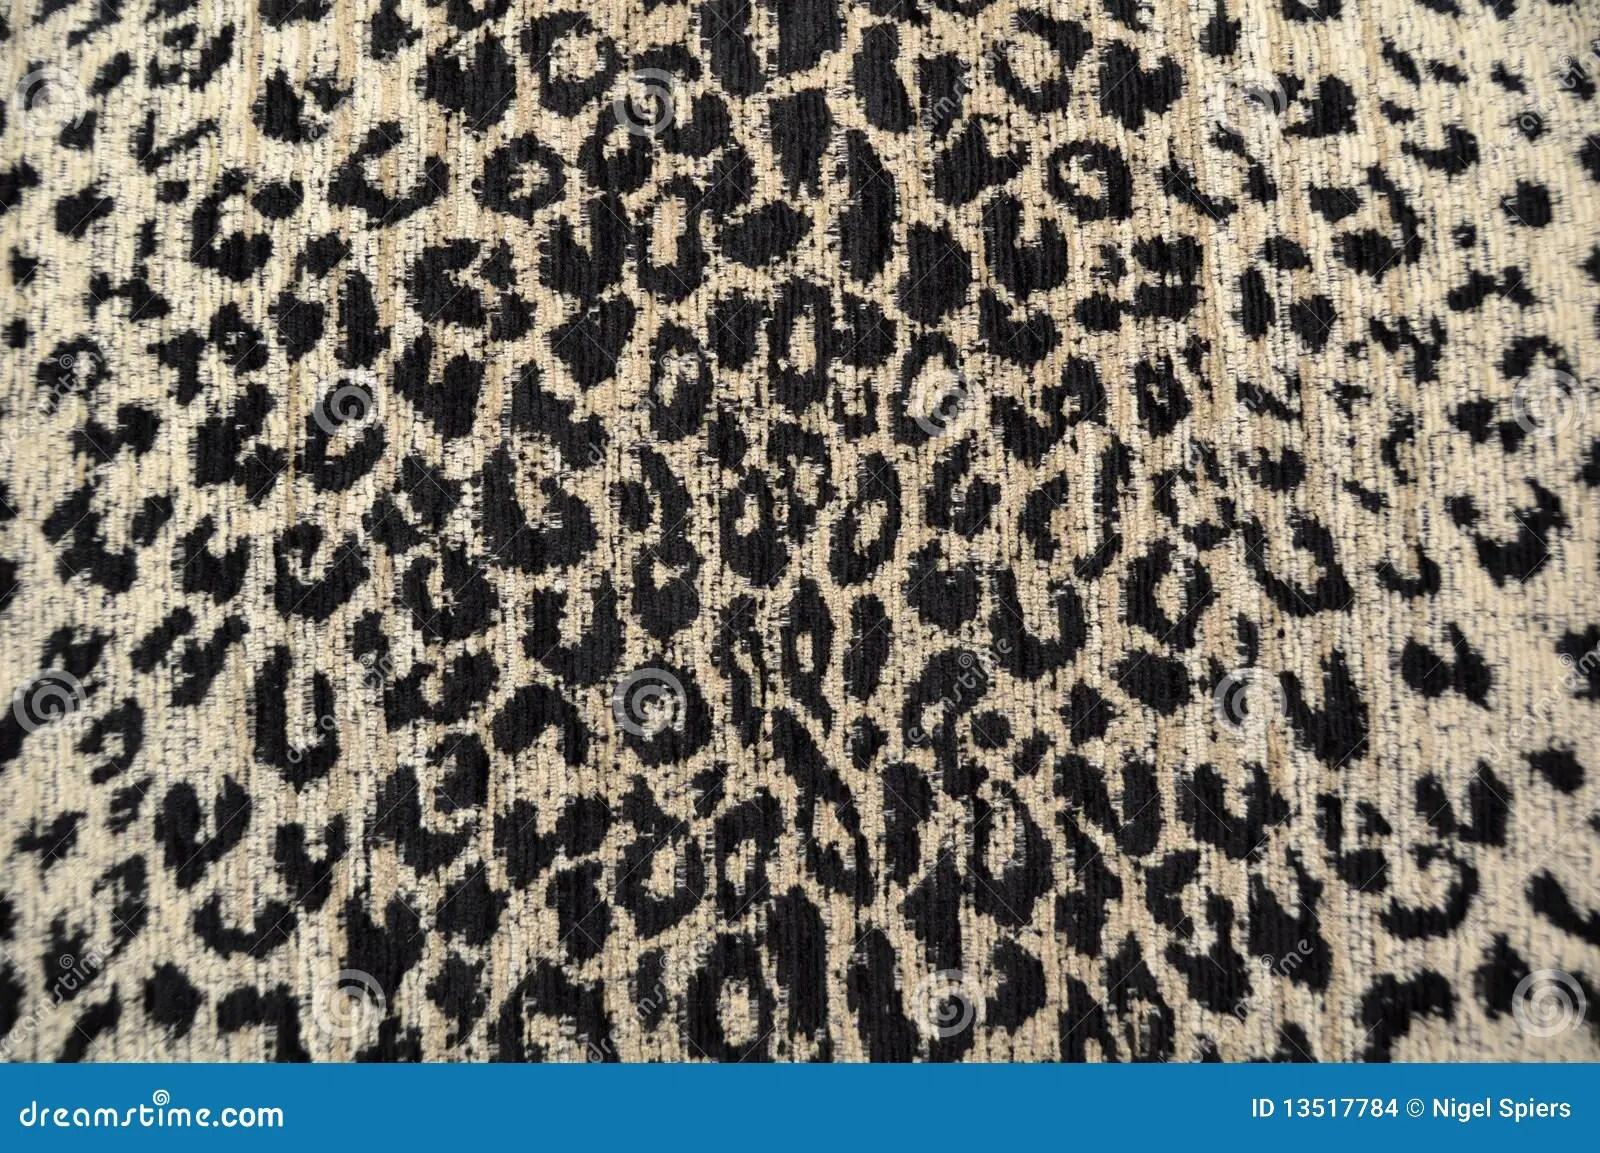 Leopard Fabric Black  Cream Stock Photo  Image 13517784